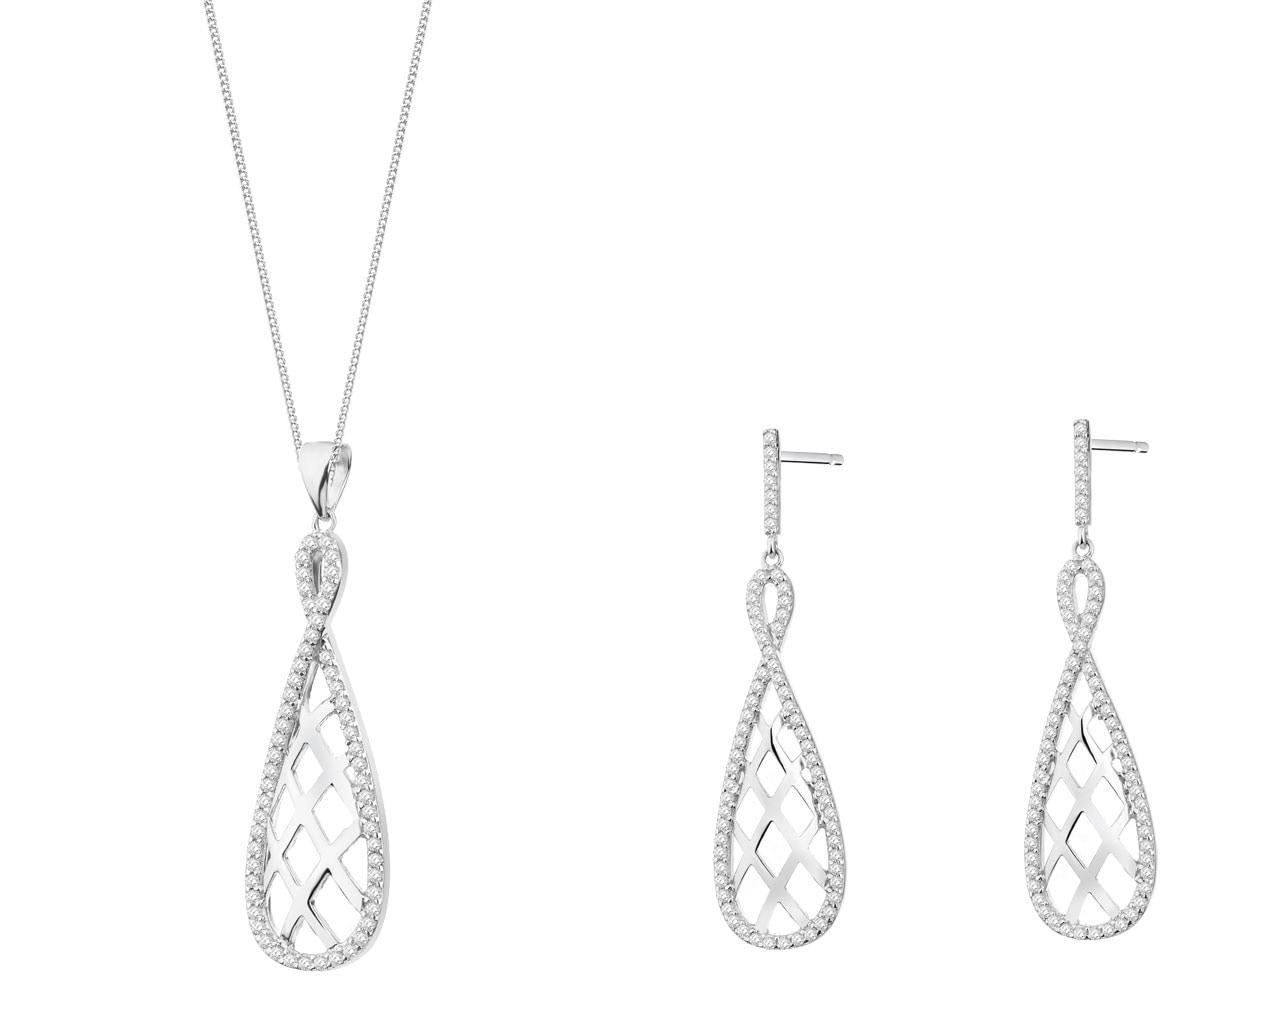 7c61a4b502 Biżuteria srebrna   Apart